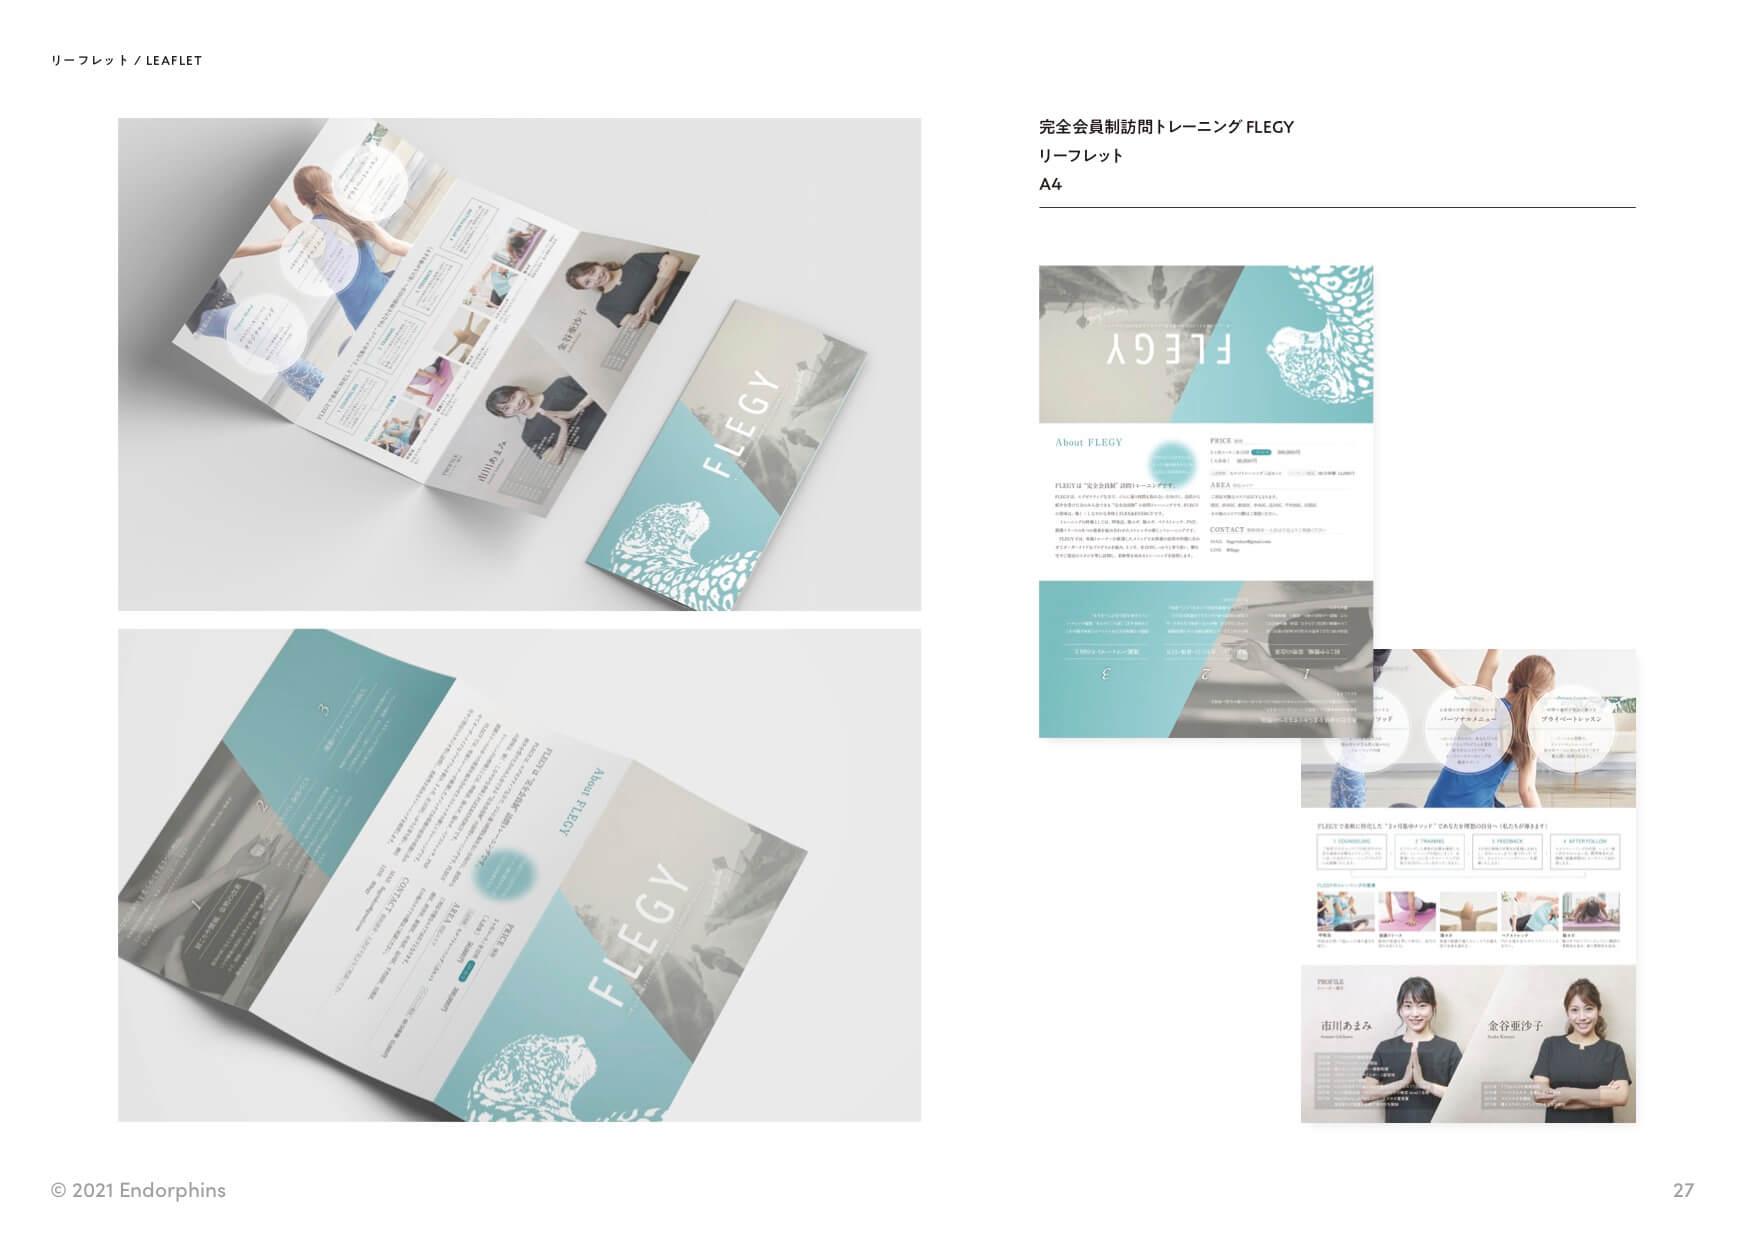 webサイト制作&デザイン制作実績一覧5